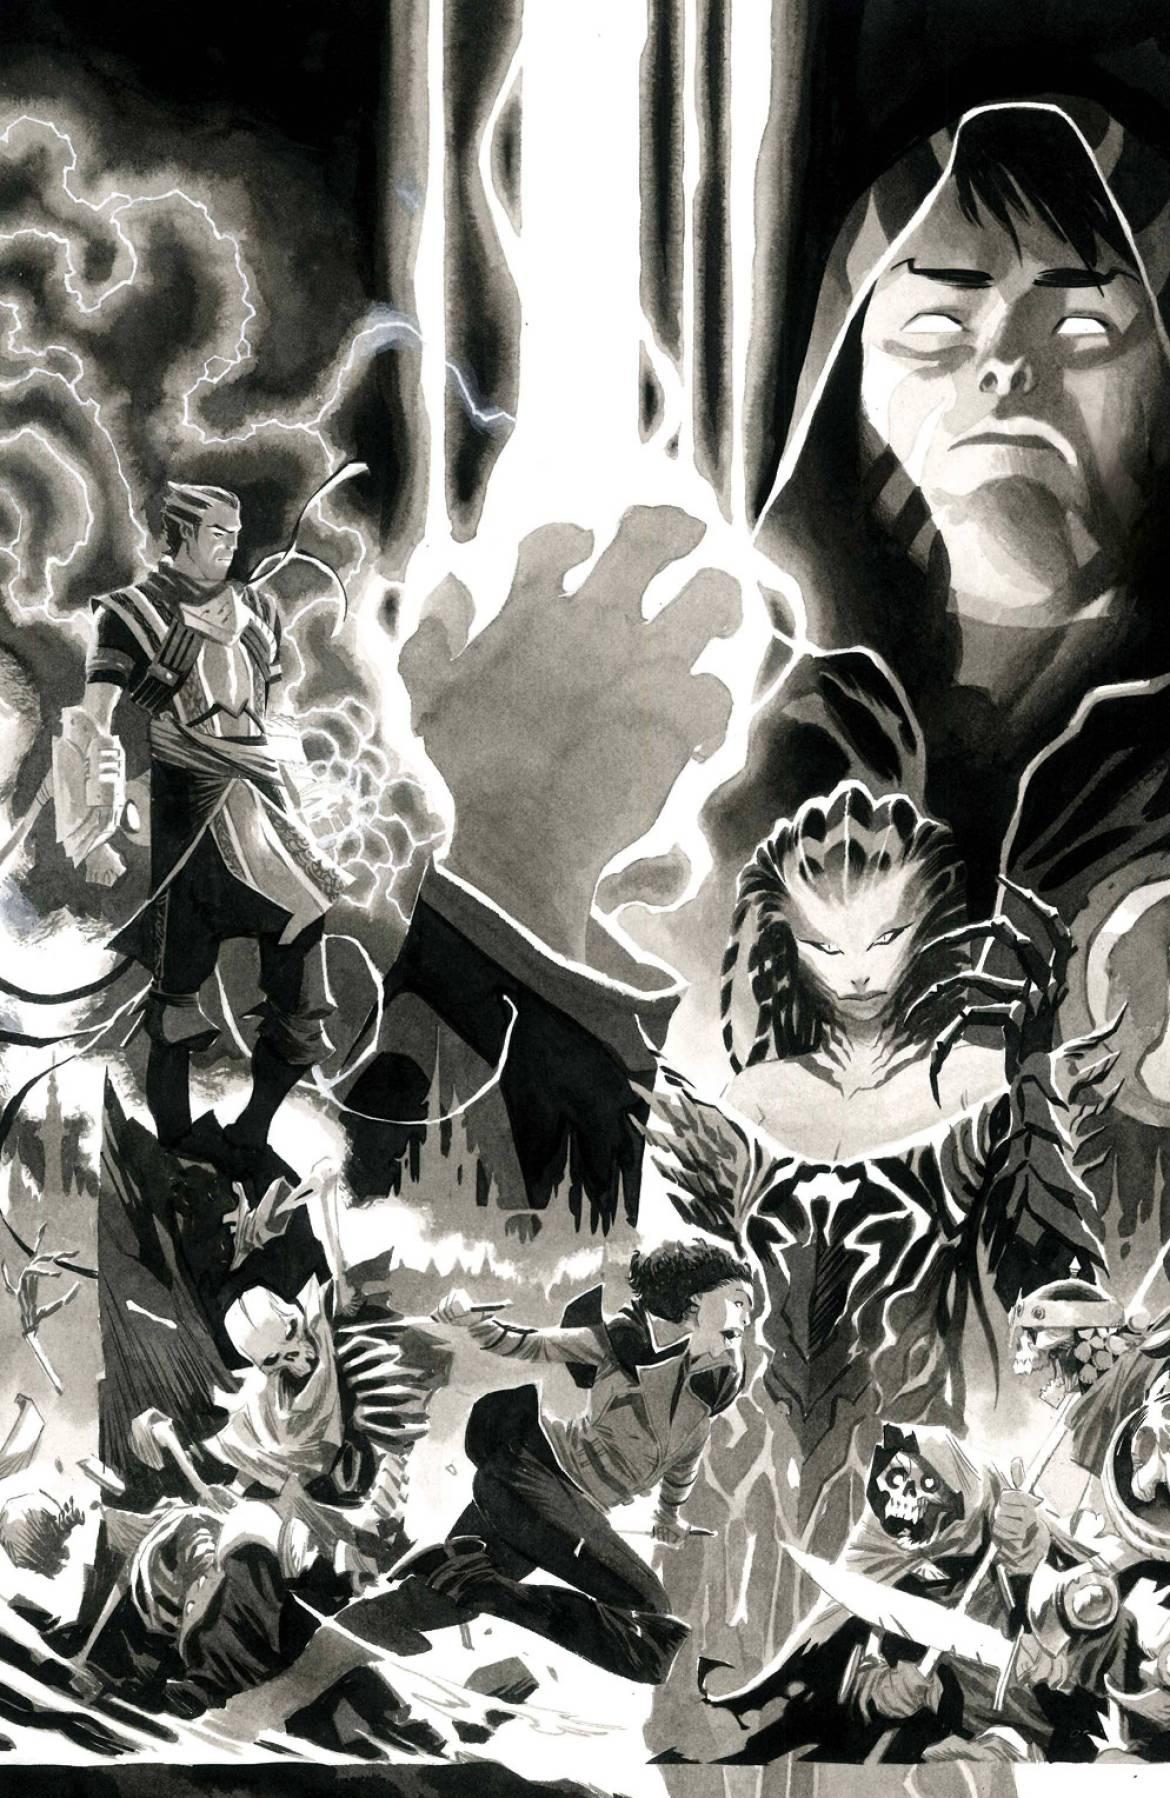 STL189402 ComicList: BOOM! Studios New Releases for 04/07/2021